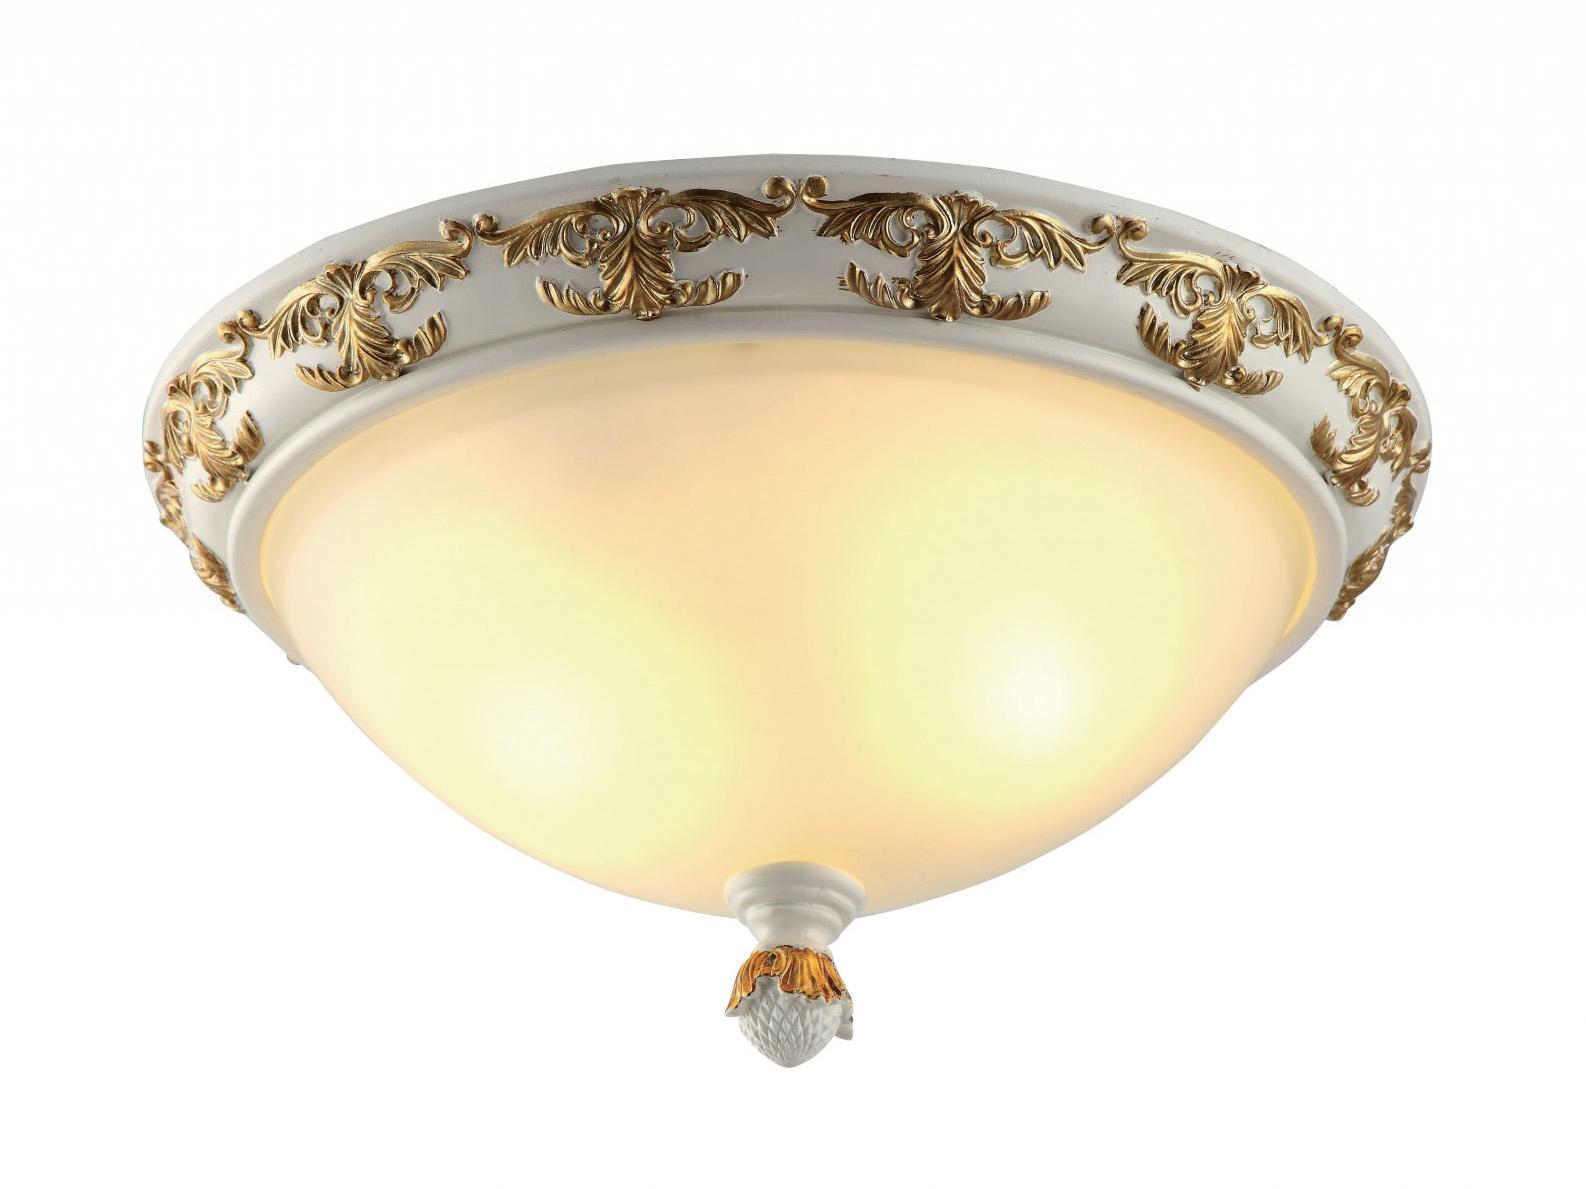 A9570PL-2WG BENESSERE Потолочный светильник pl ip8 tsled 1 2 gn